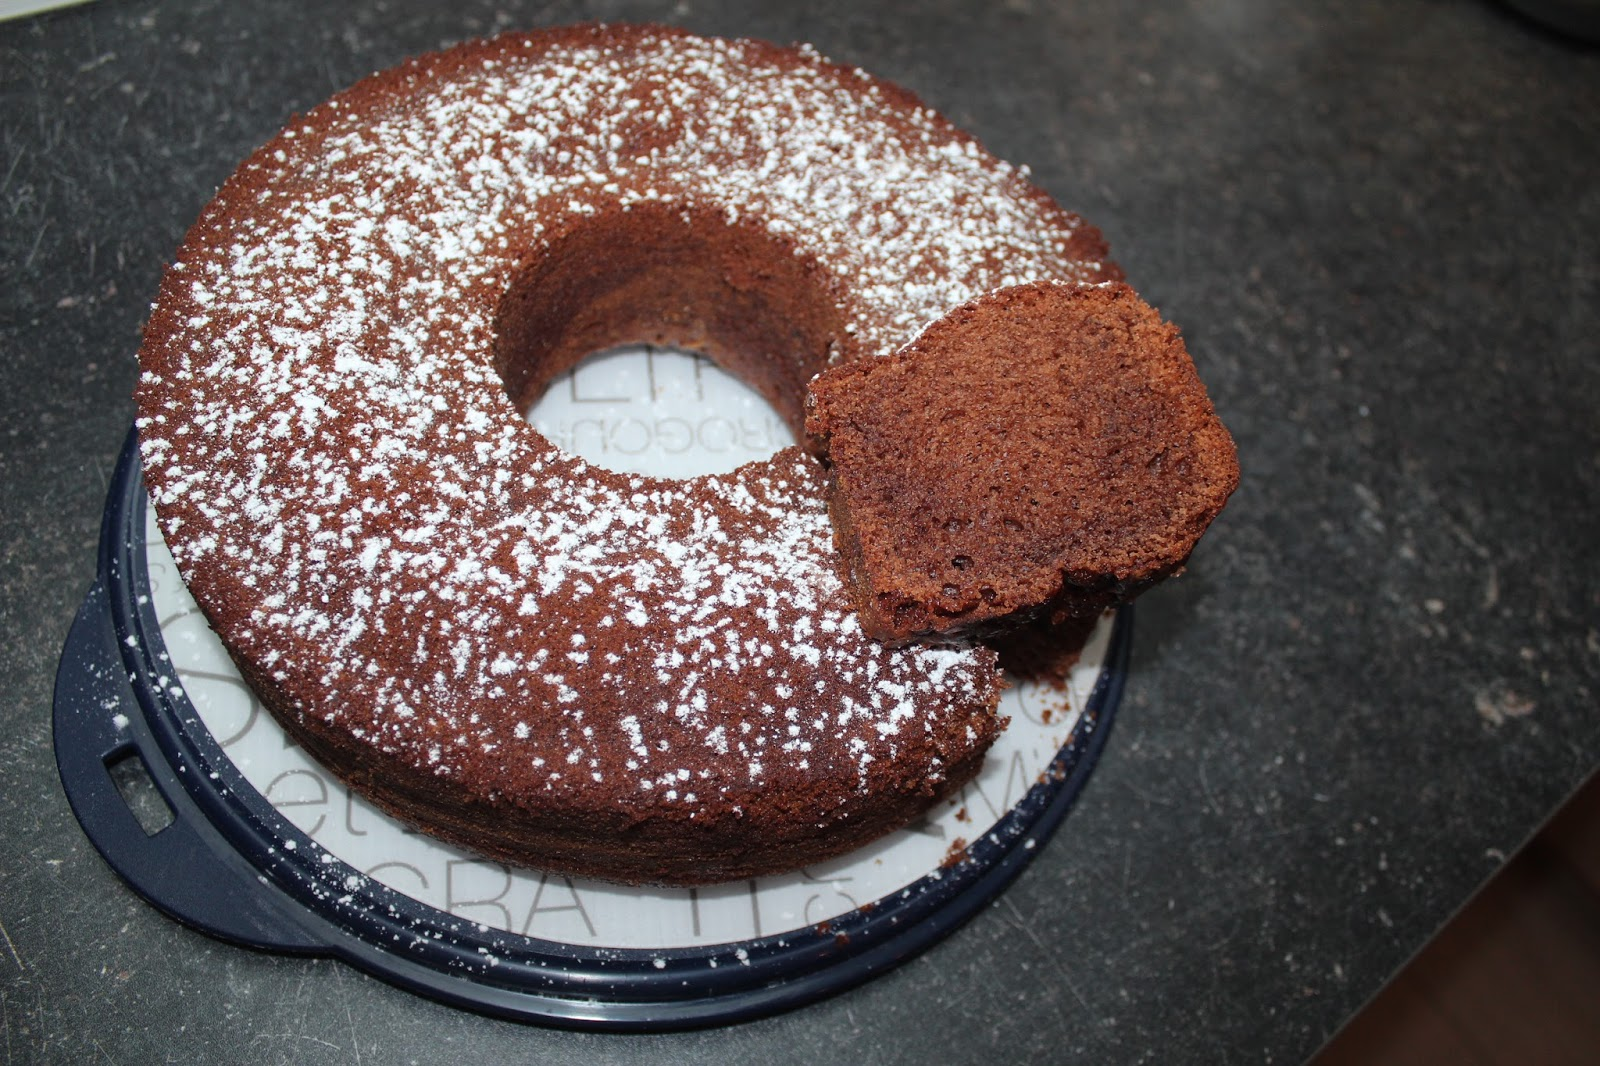 Sauers Kuchenzauber Nutellakuchen Variante 1 Thermomix Rezept